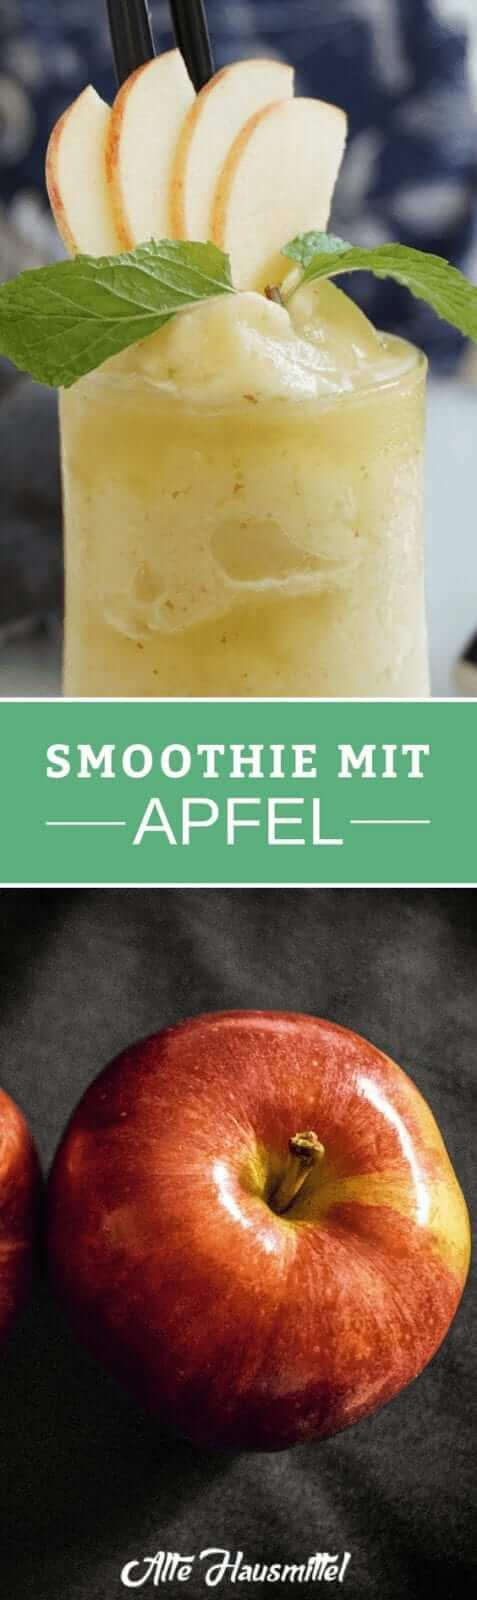 Smoothie mit Apfel